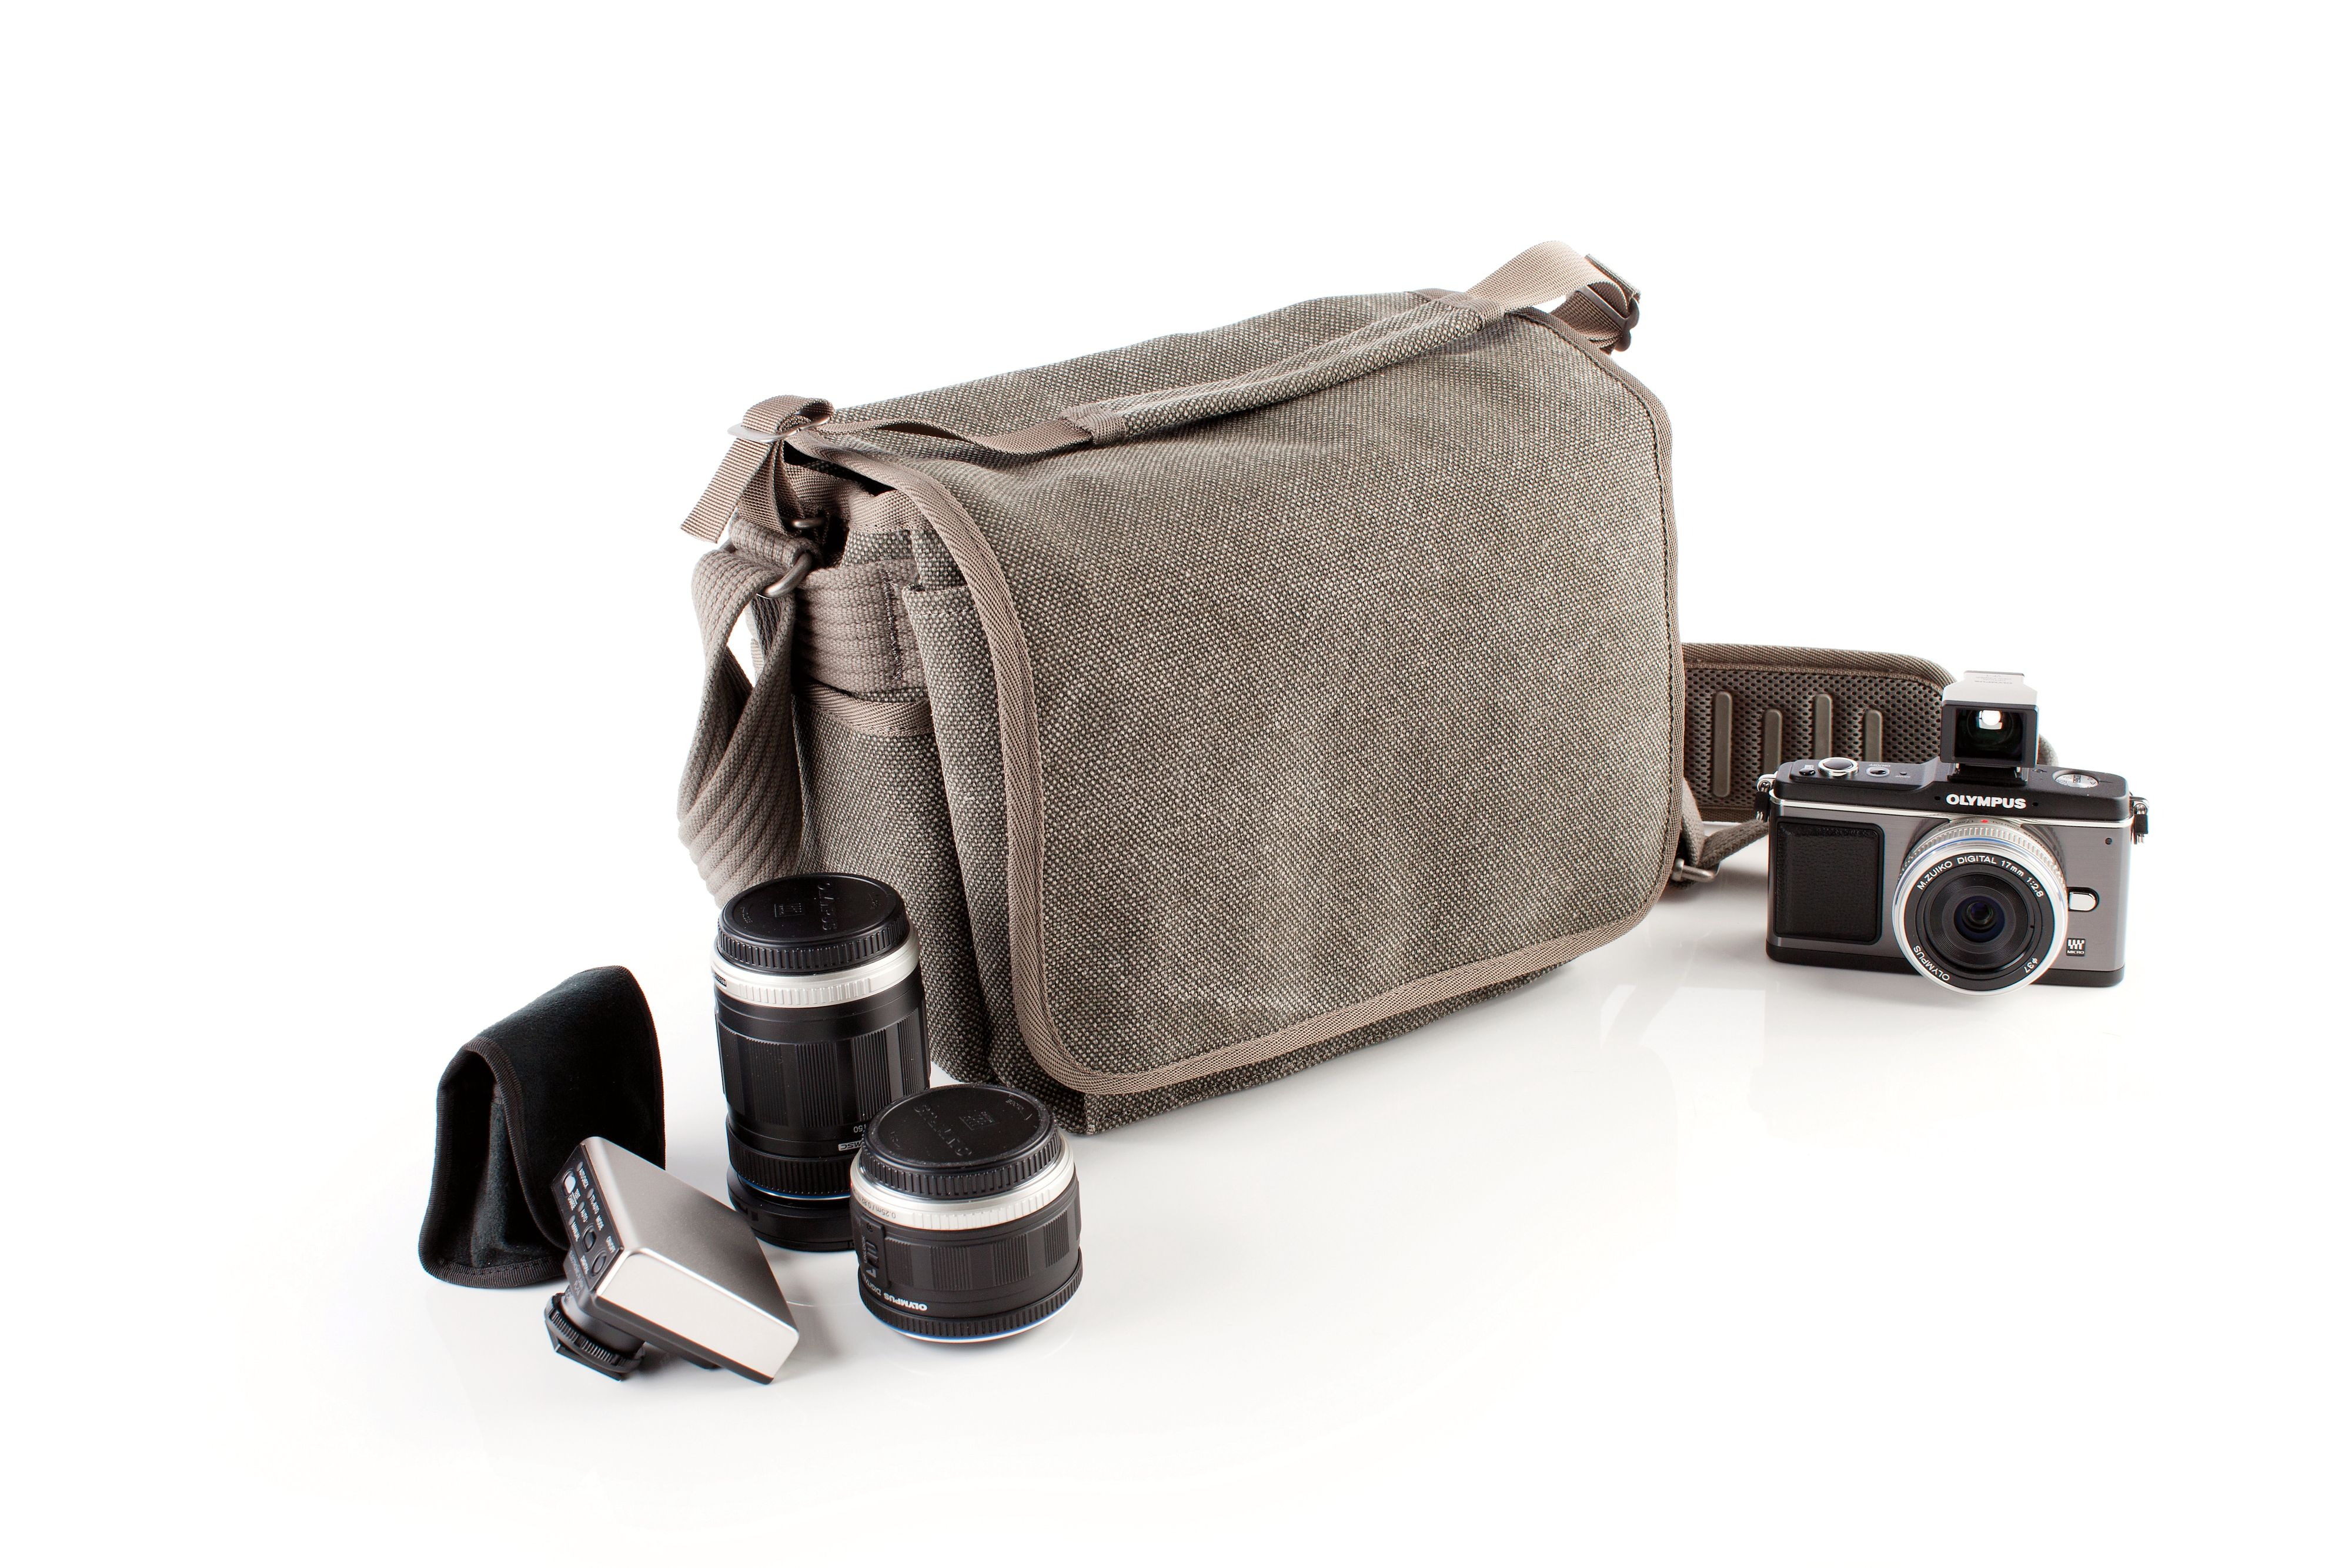 Think Tanks nye Retrospective 5, som har plass til et helt kamerasystem